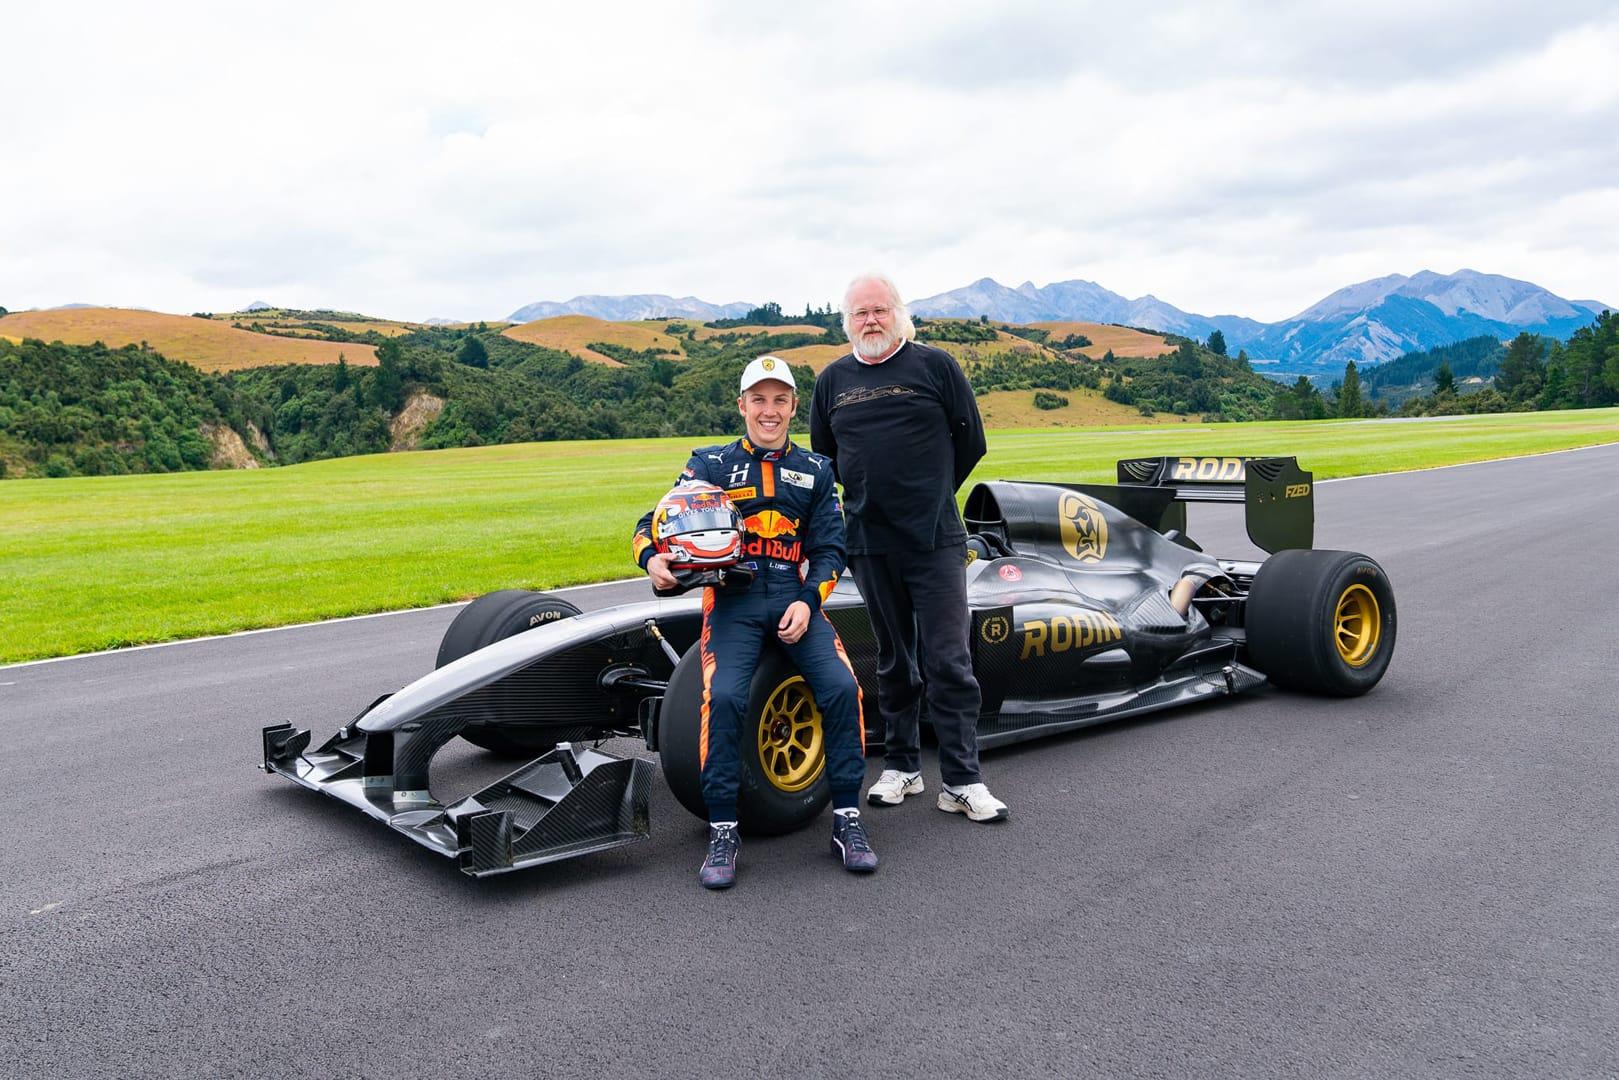 Rodin Cars Announces Formula 2 Partnership With Liam Lawson